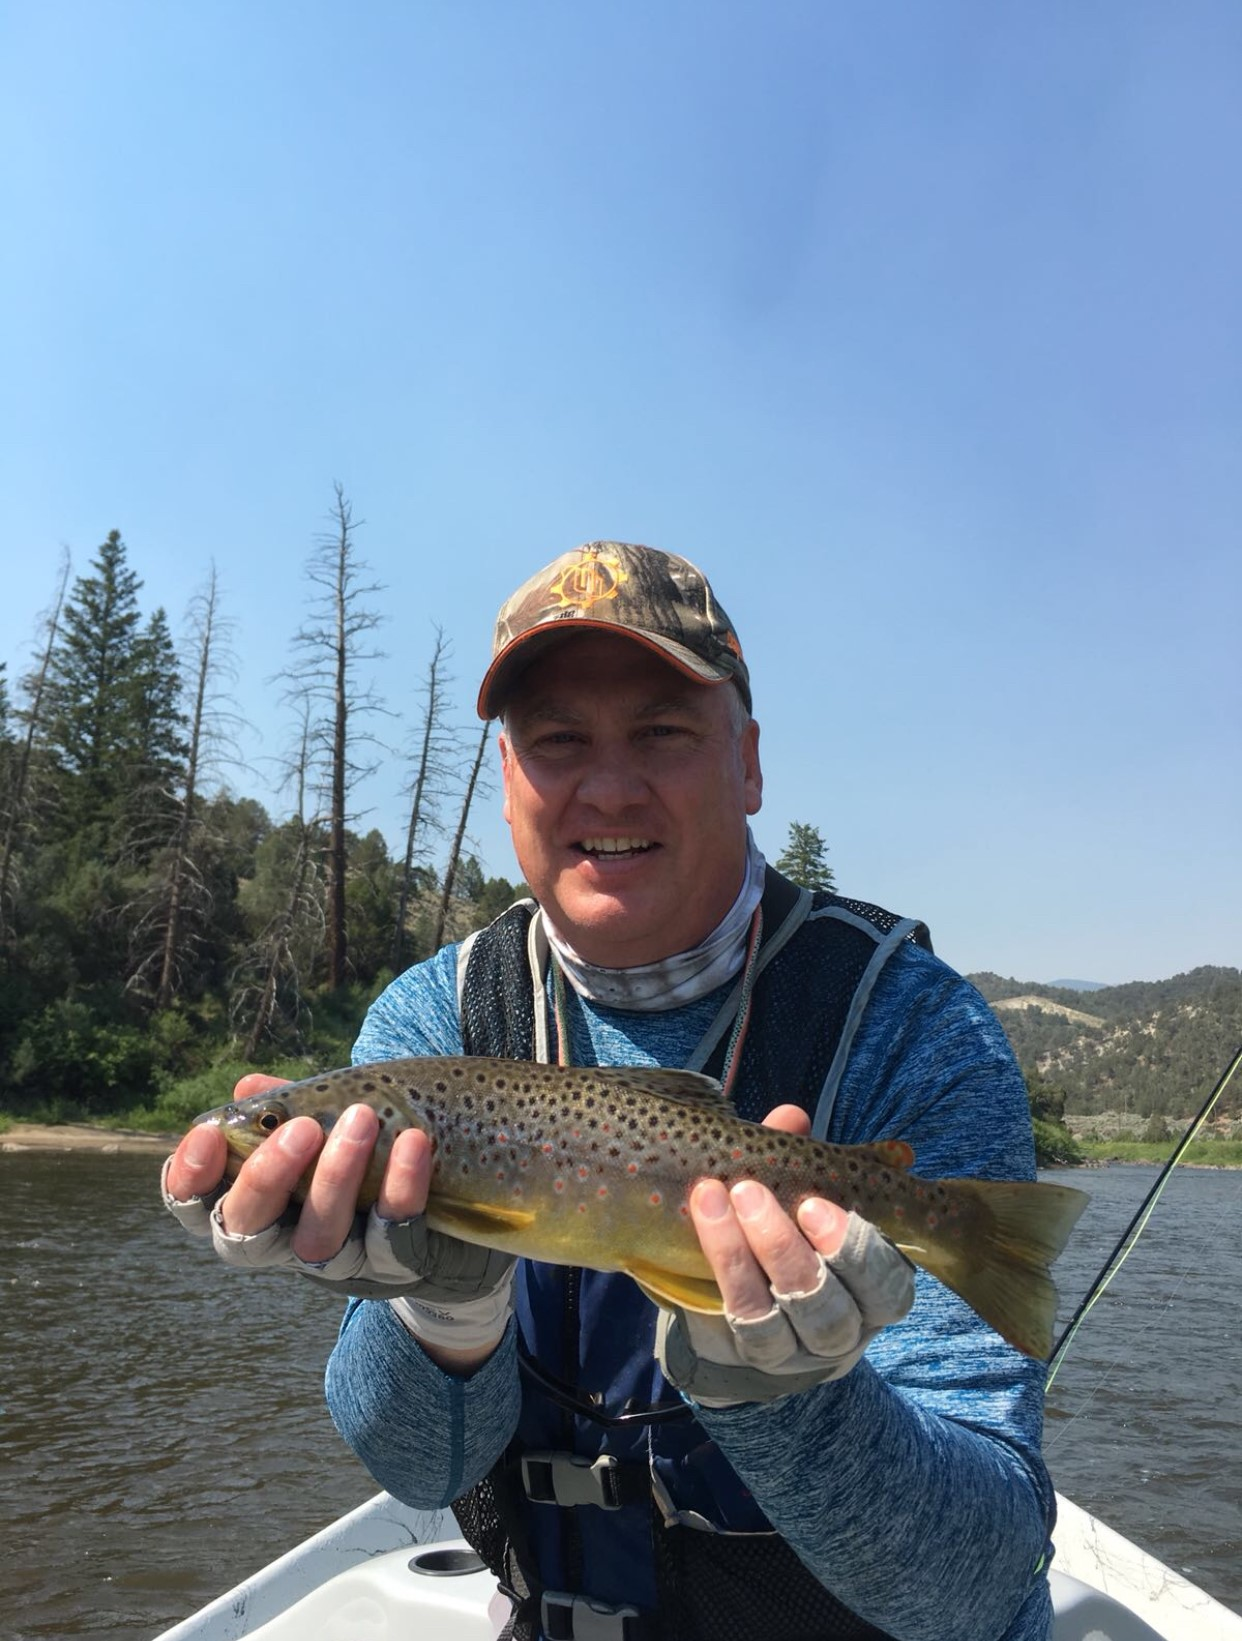 June 30: Fishing Report – Archery School of the Rockies – Outdoor Buddies